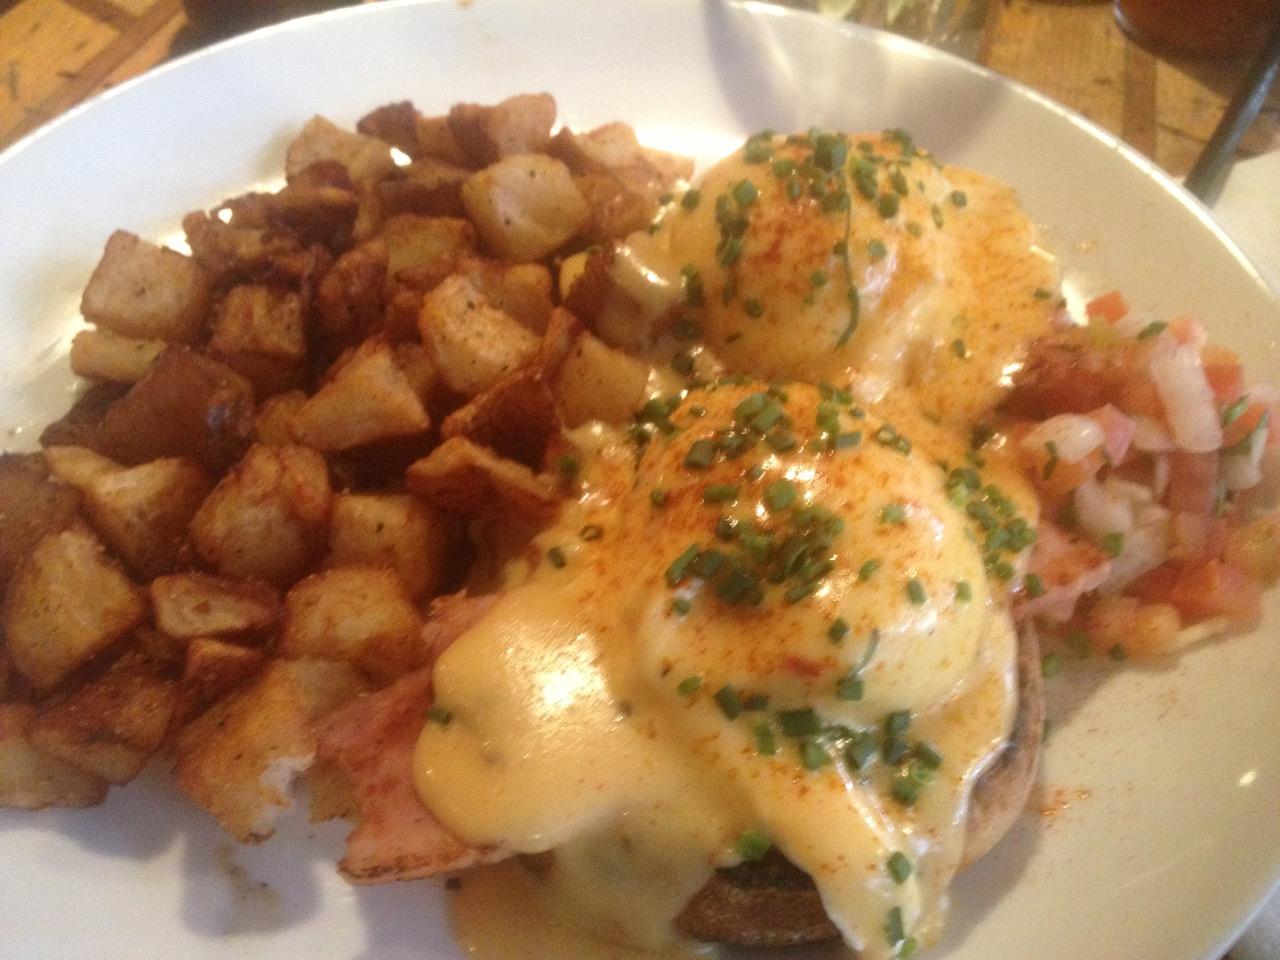 Breakfast at Peso's Kitchen – February 16 2013